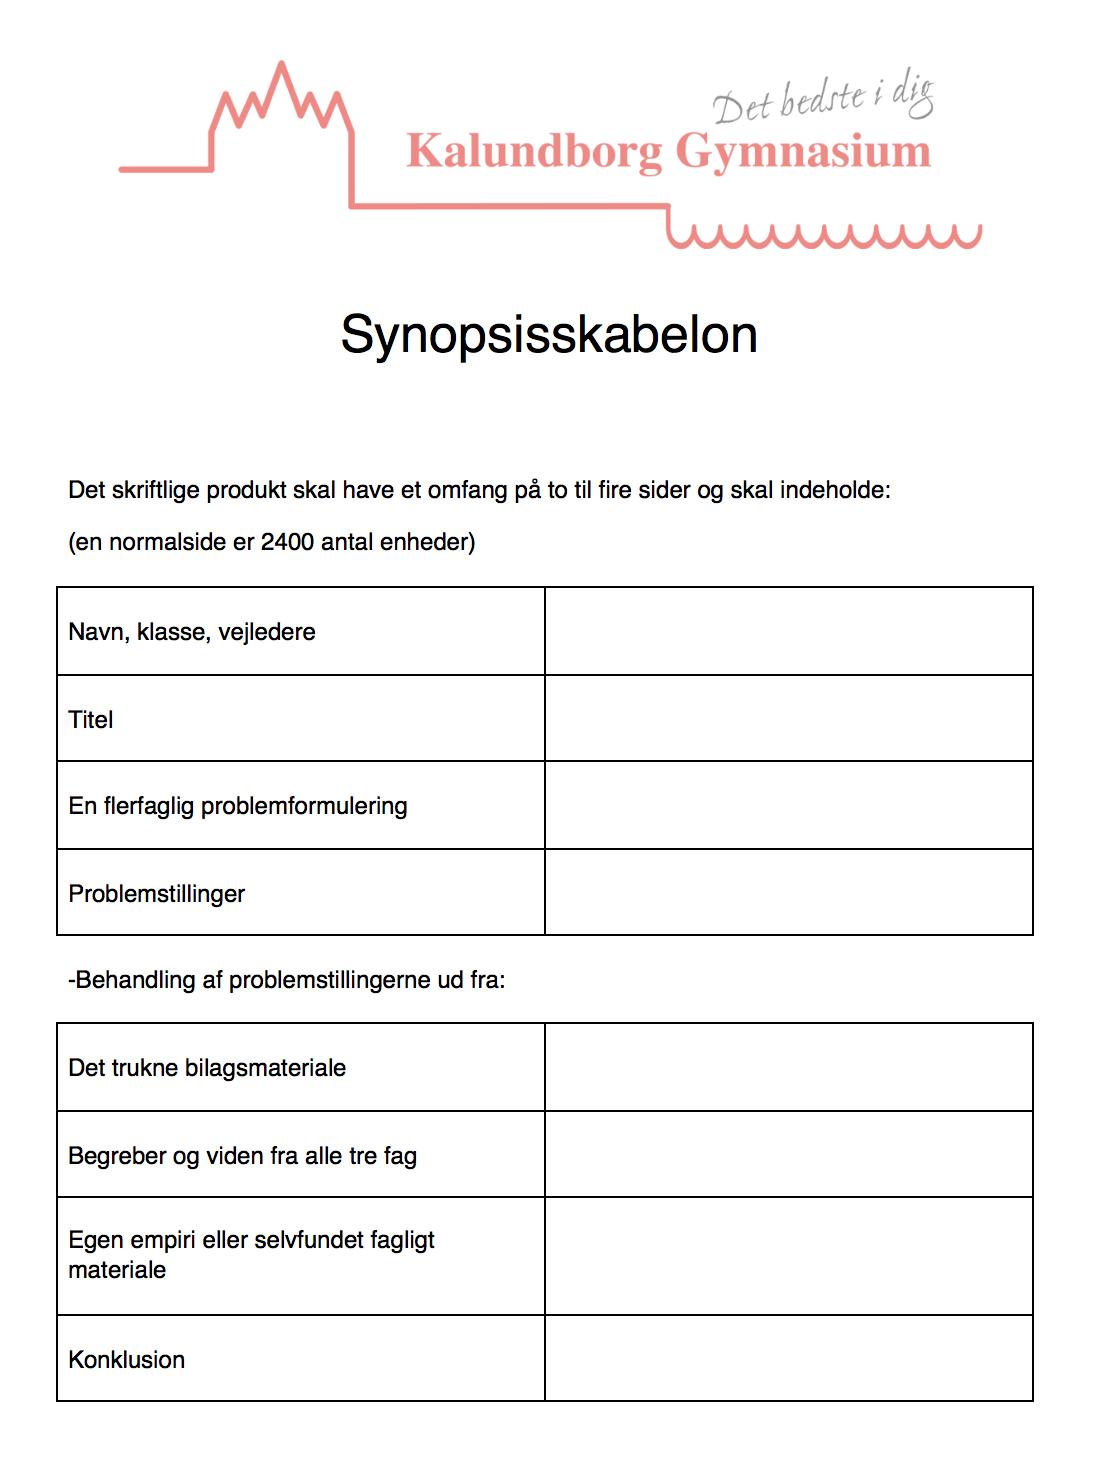 at eksamen synopsis eksempel